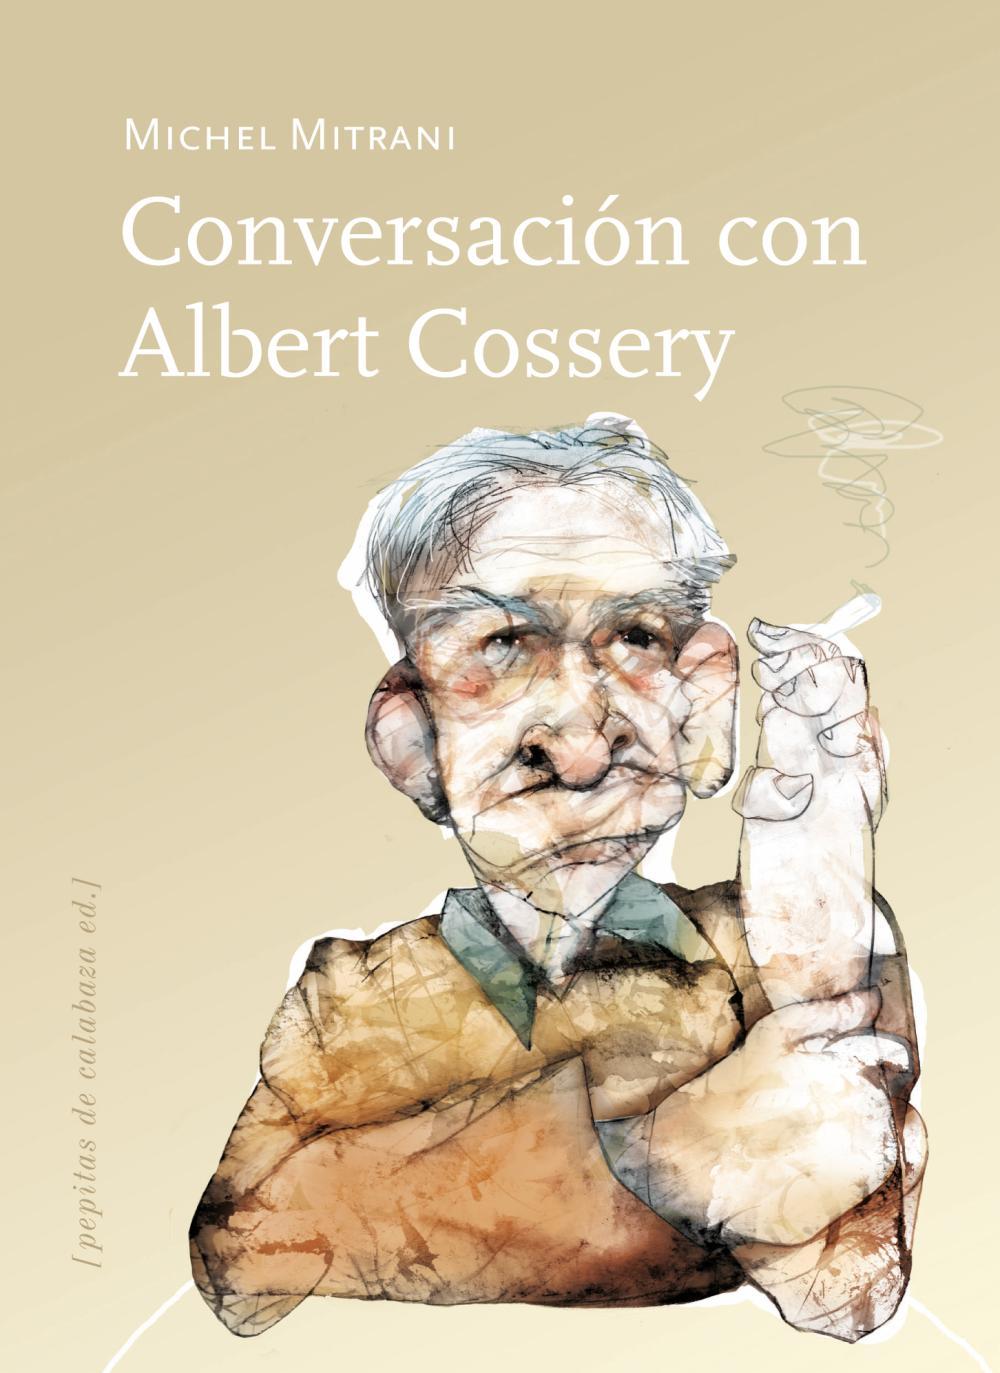 Conversación con Albert Cossery